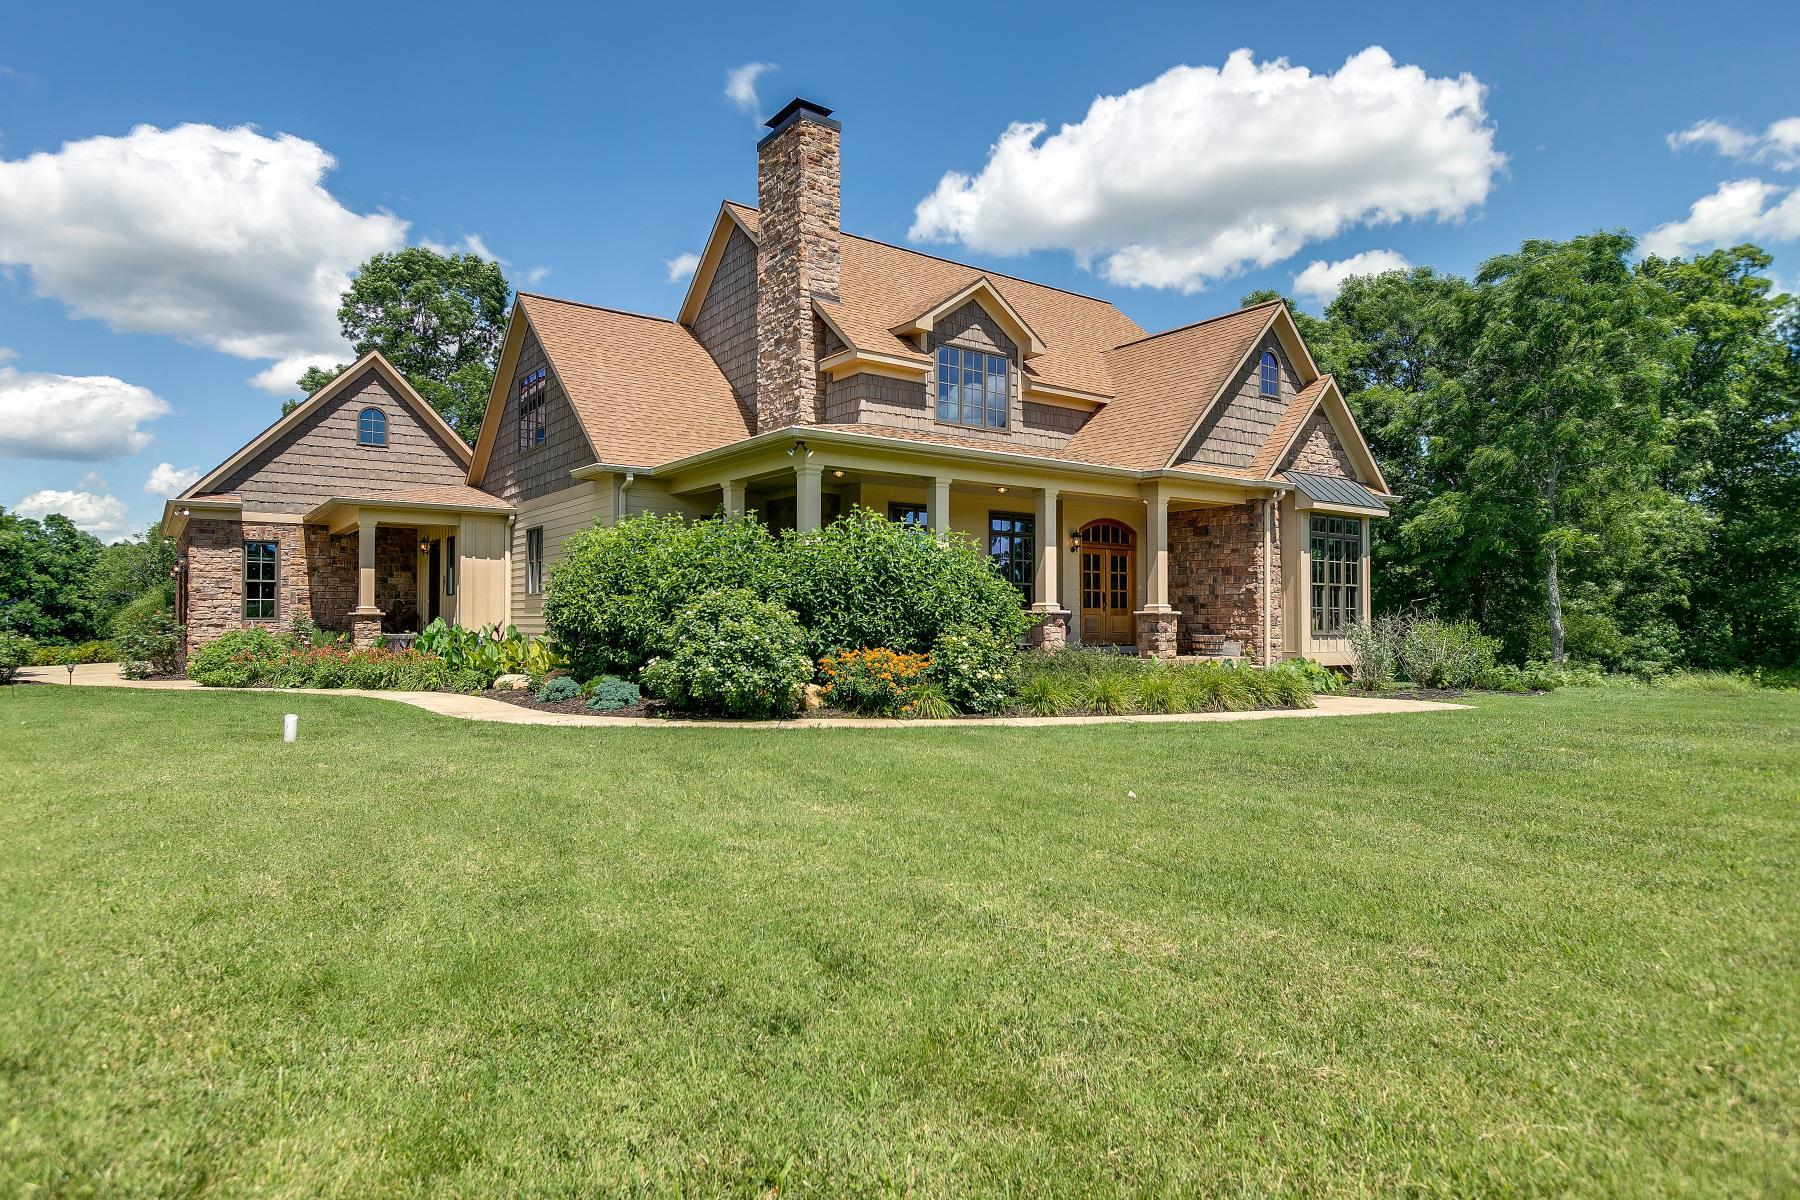 60 Walker Rd, Summertown, TN 38483 - Summertown, TN real estate listing